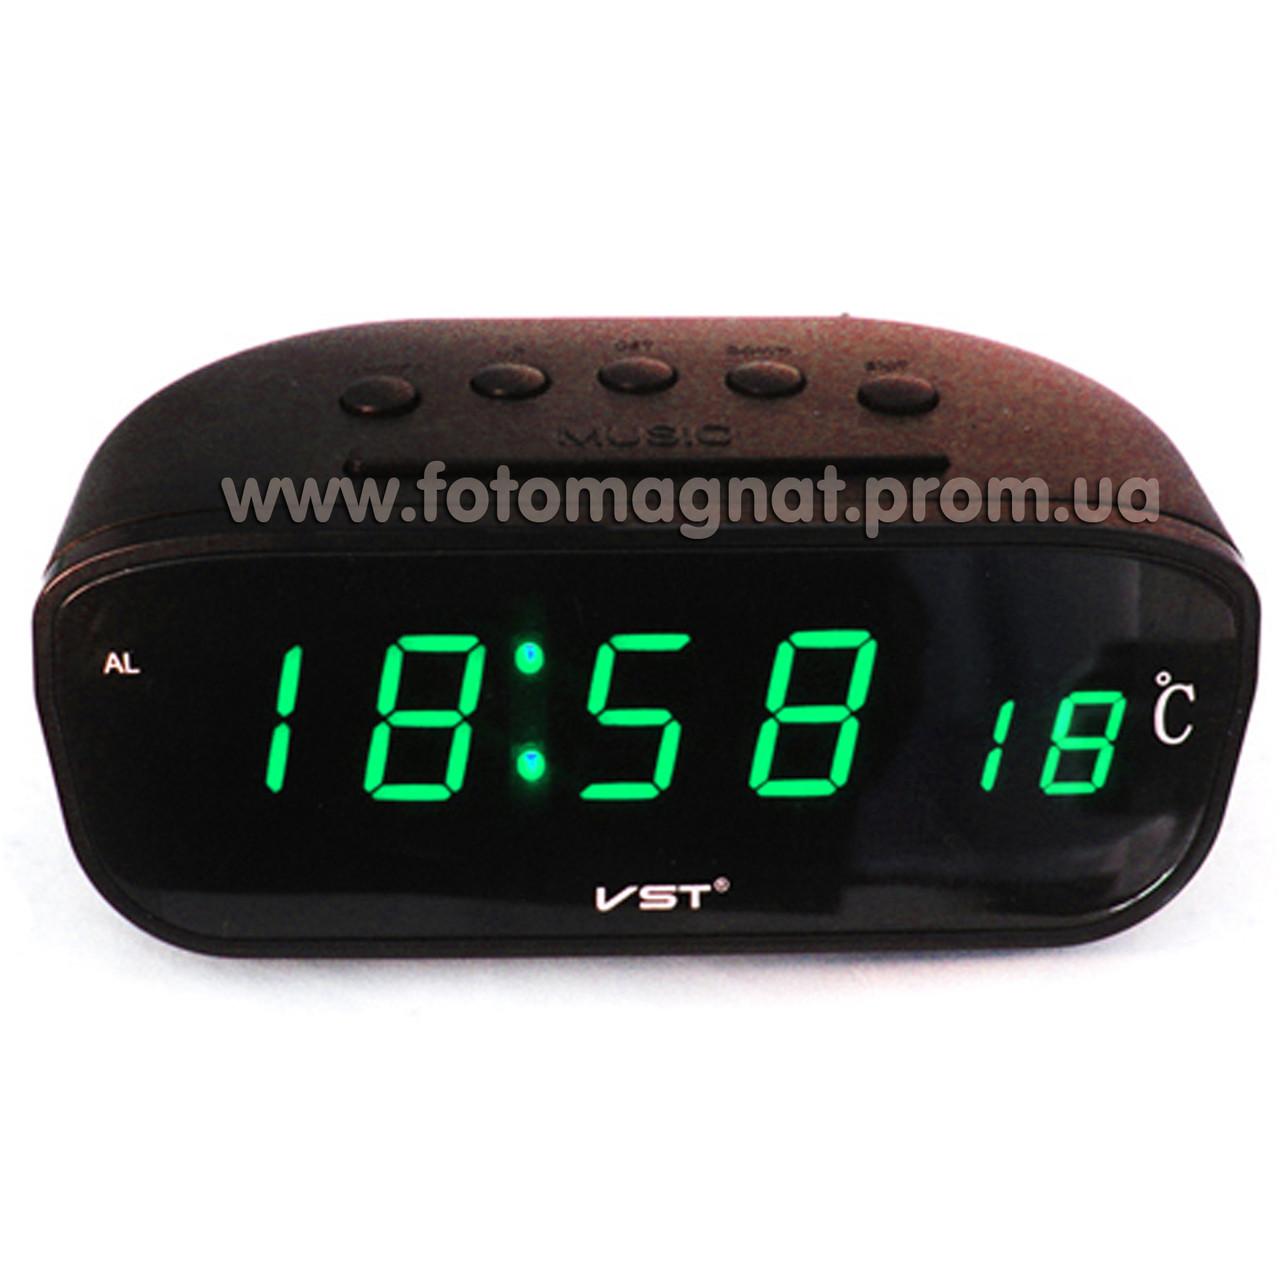 Часы сетевые  VST 803-4, Настольные электронные часы